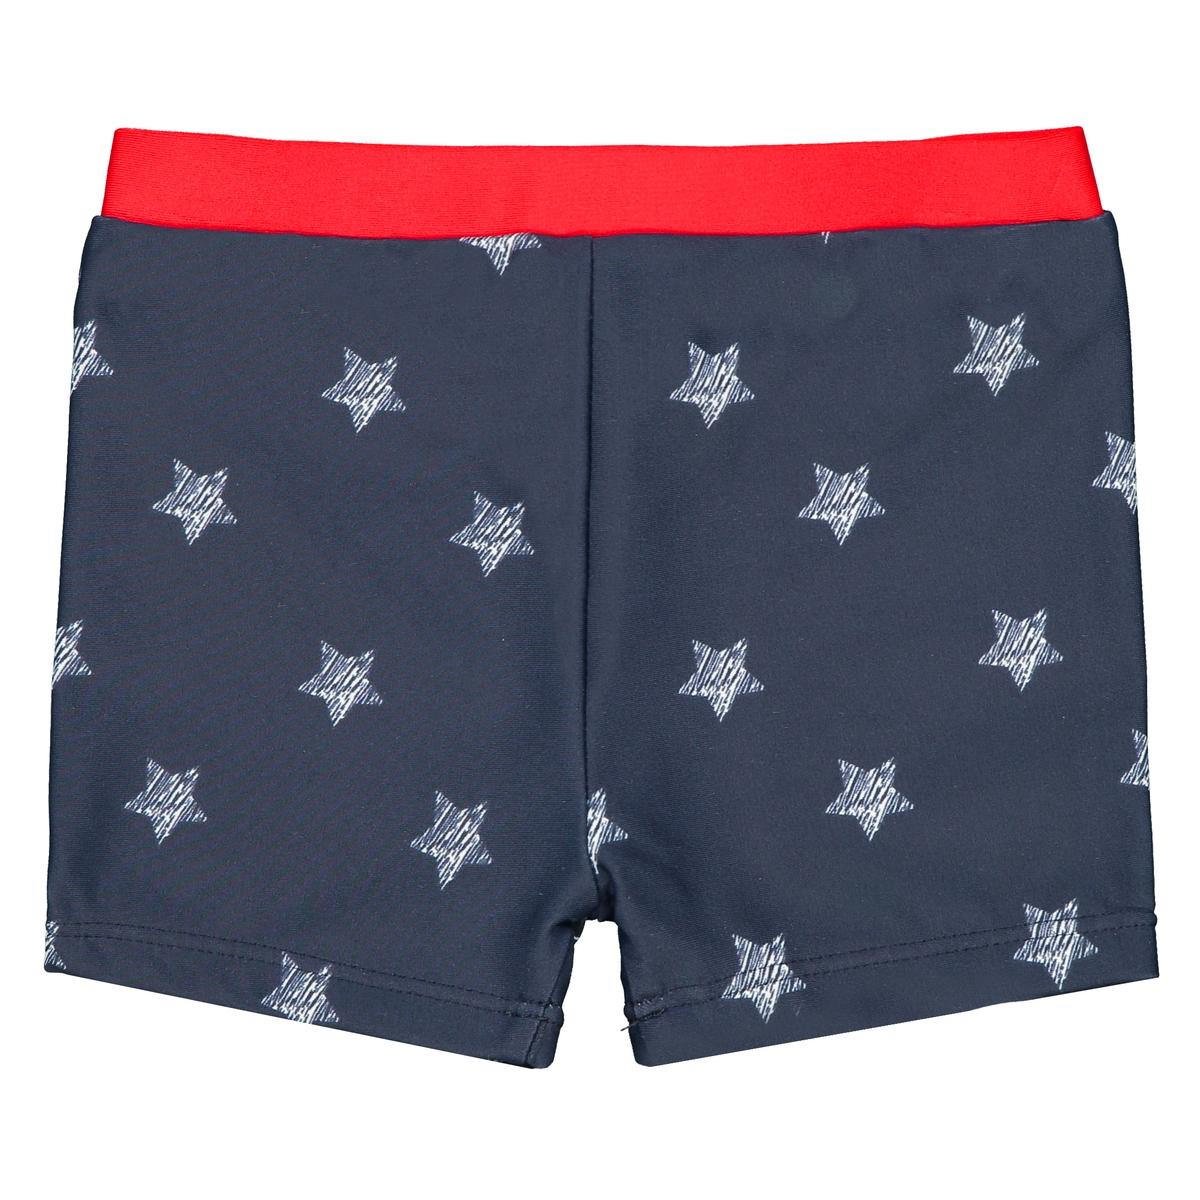 Плавки-боксеры La Redoute С рисунком звезды мес - года 9 мес. - 71 см синий шорты la redoute с рисунком мес года 6 мес 67 см синий